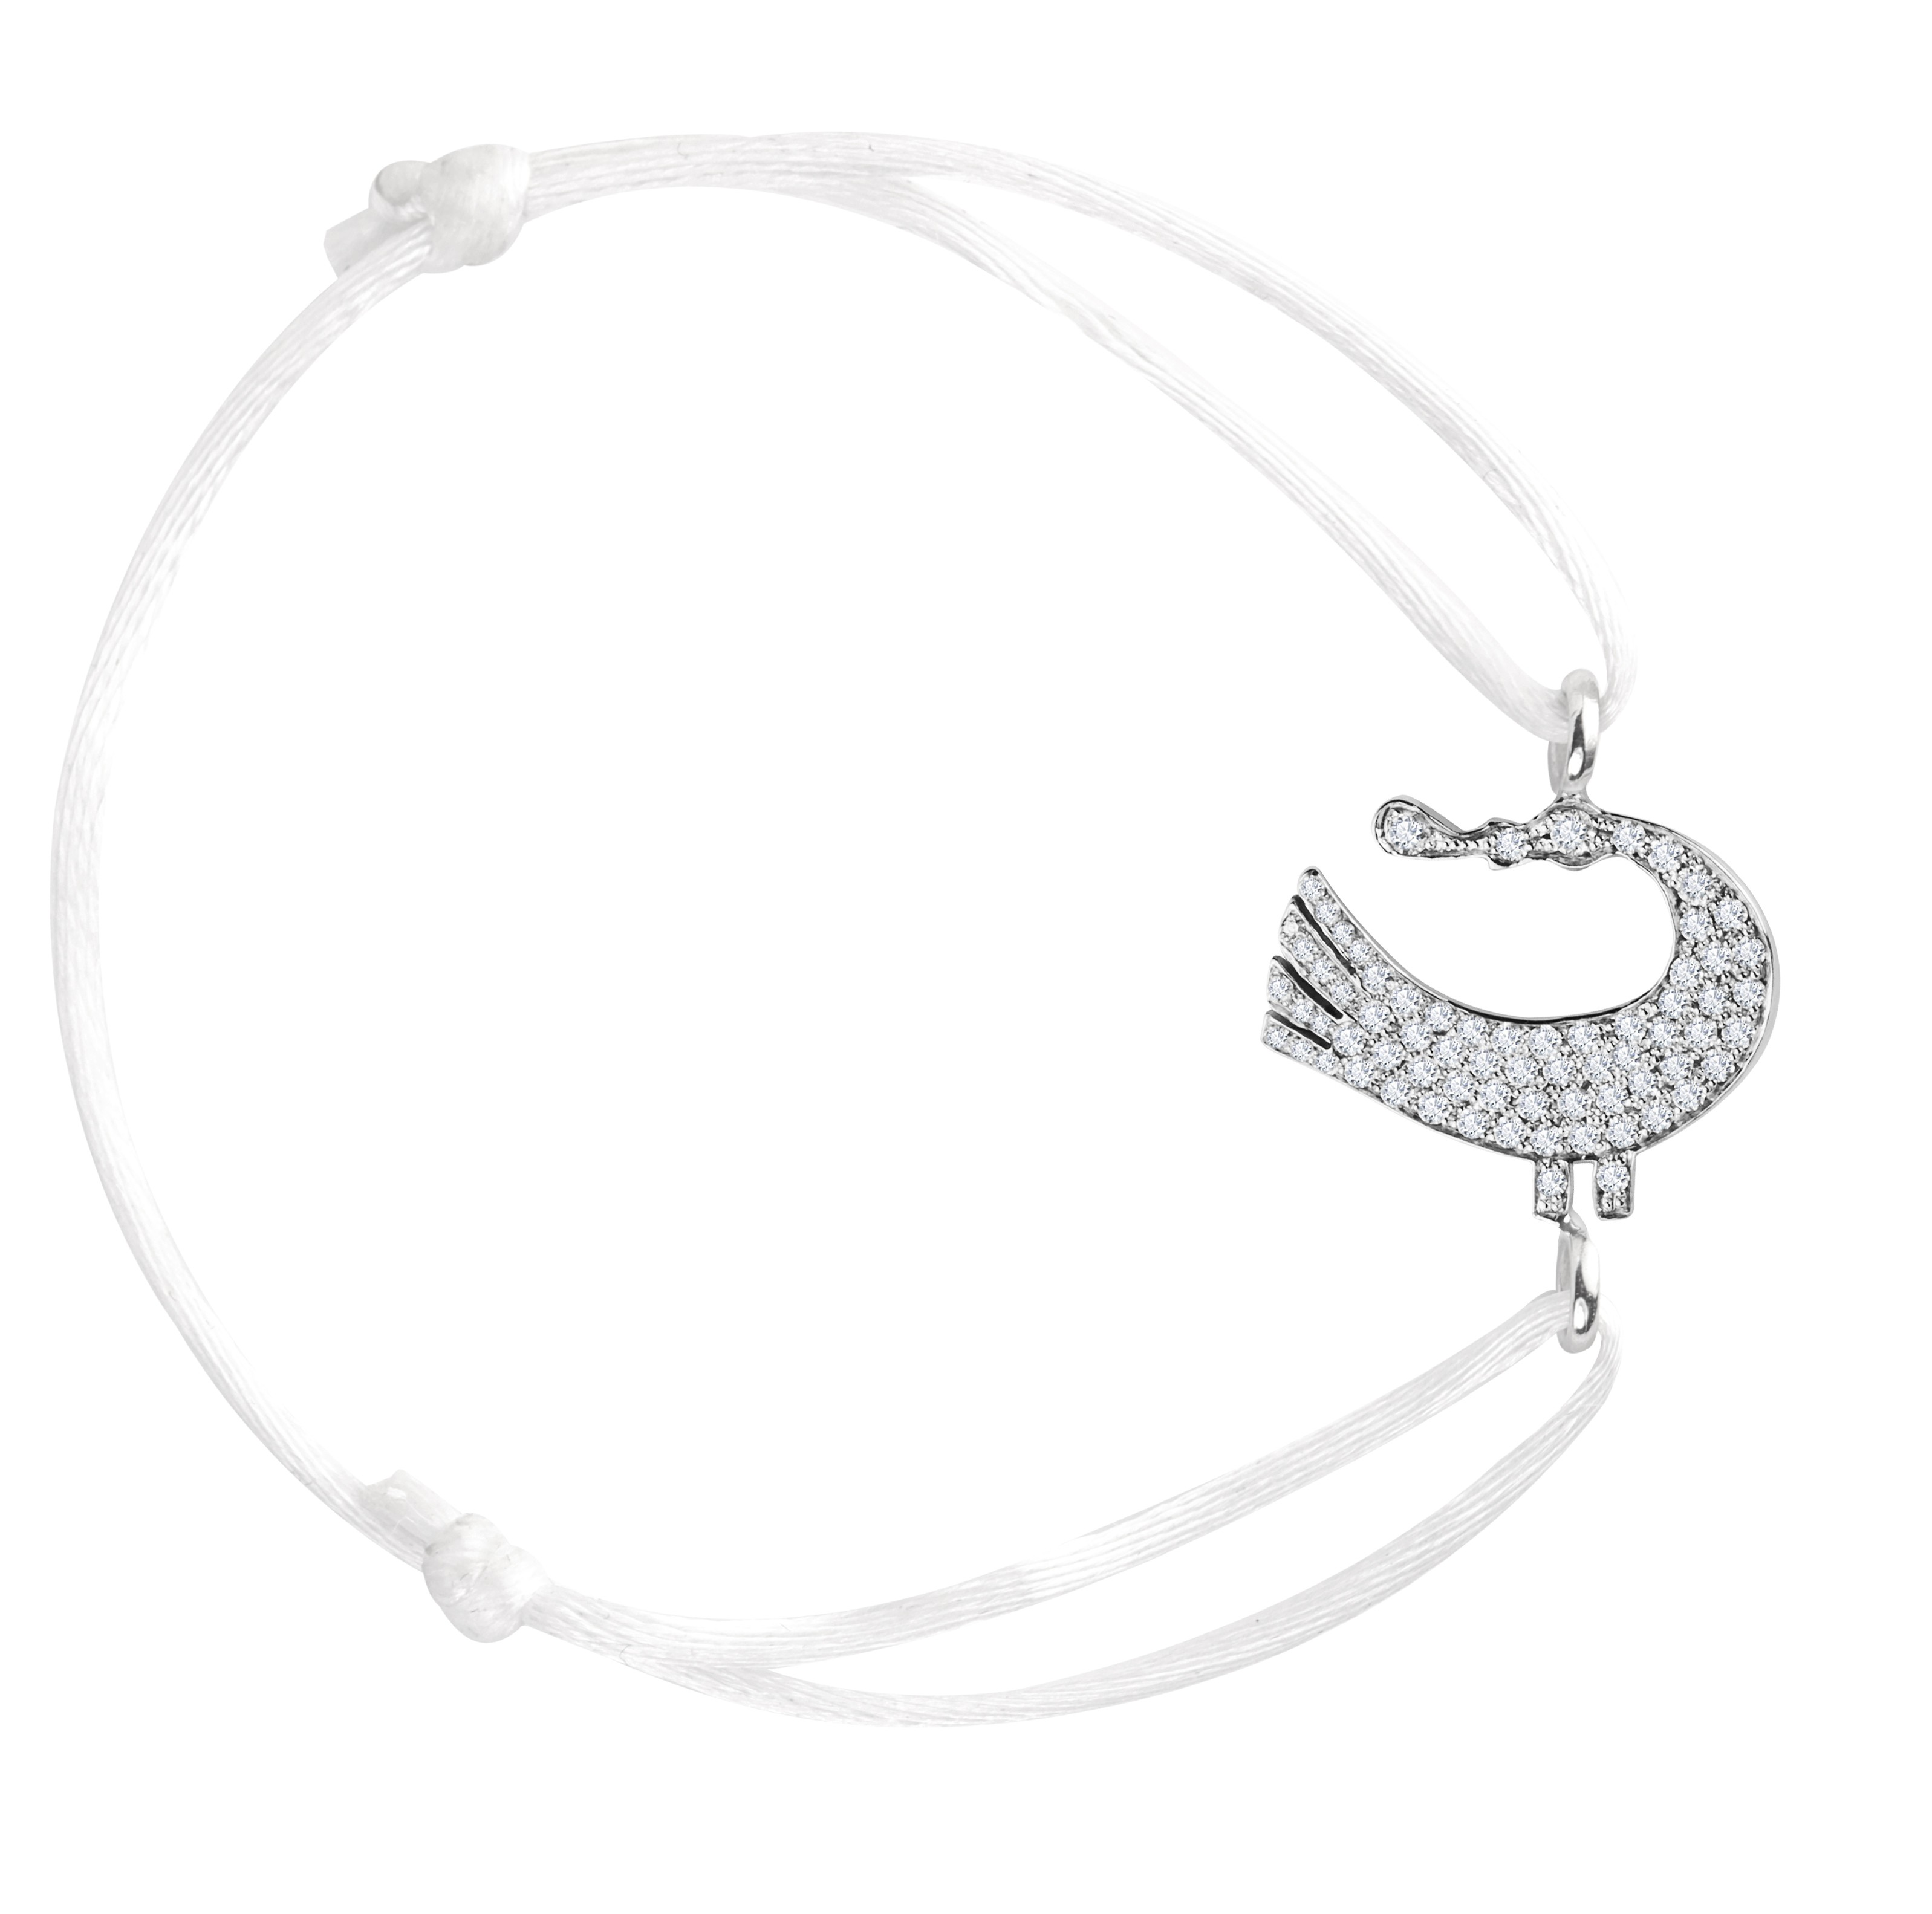 Sagesse Bakwani7 Or diamants – Bracelet Cordon